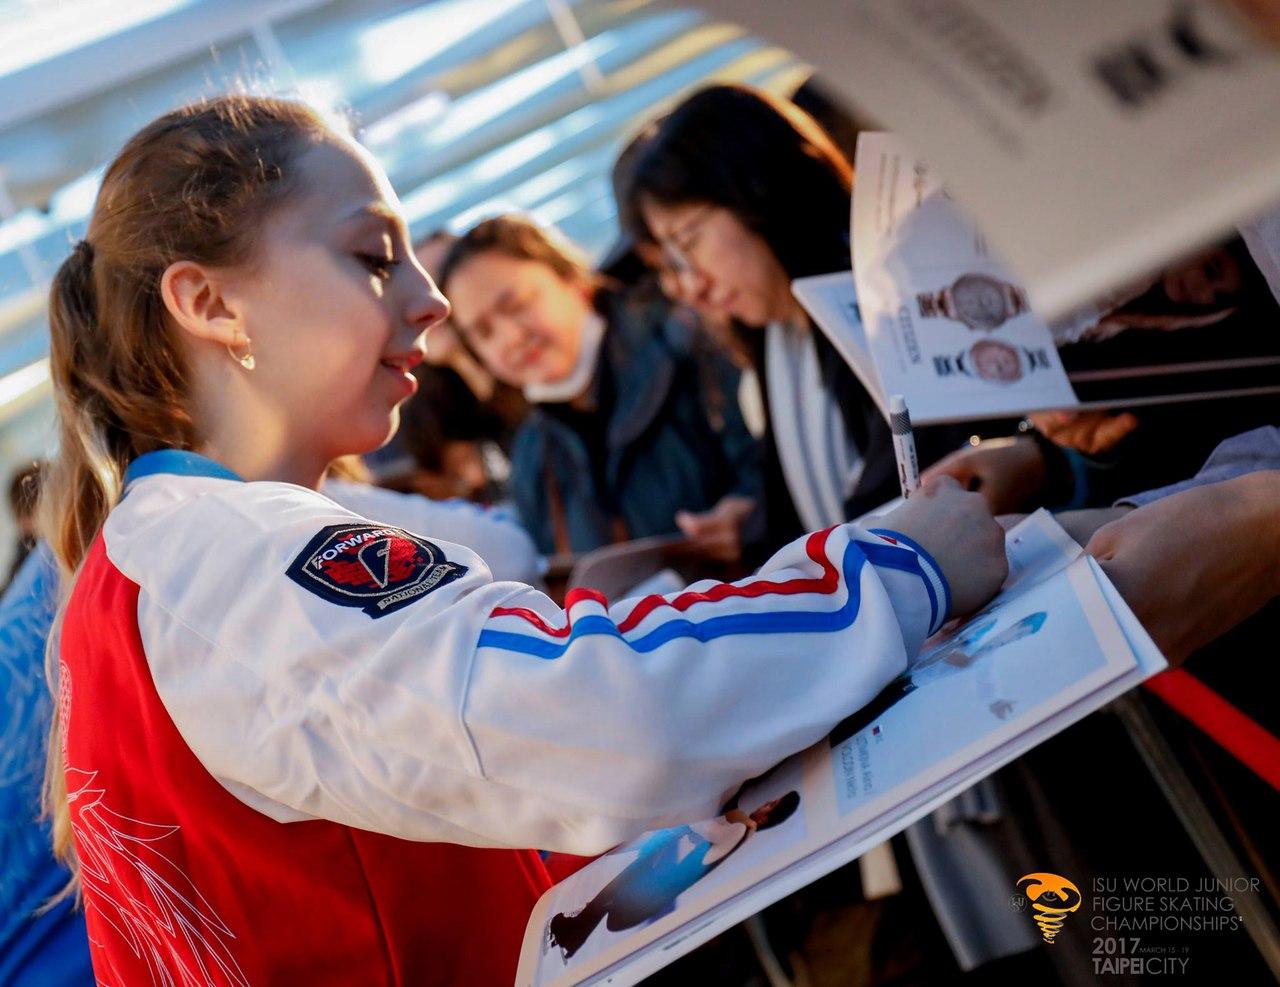 Александра Бойкова-Дмитрий Козловский - Страница 2 PW04JoHTroU